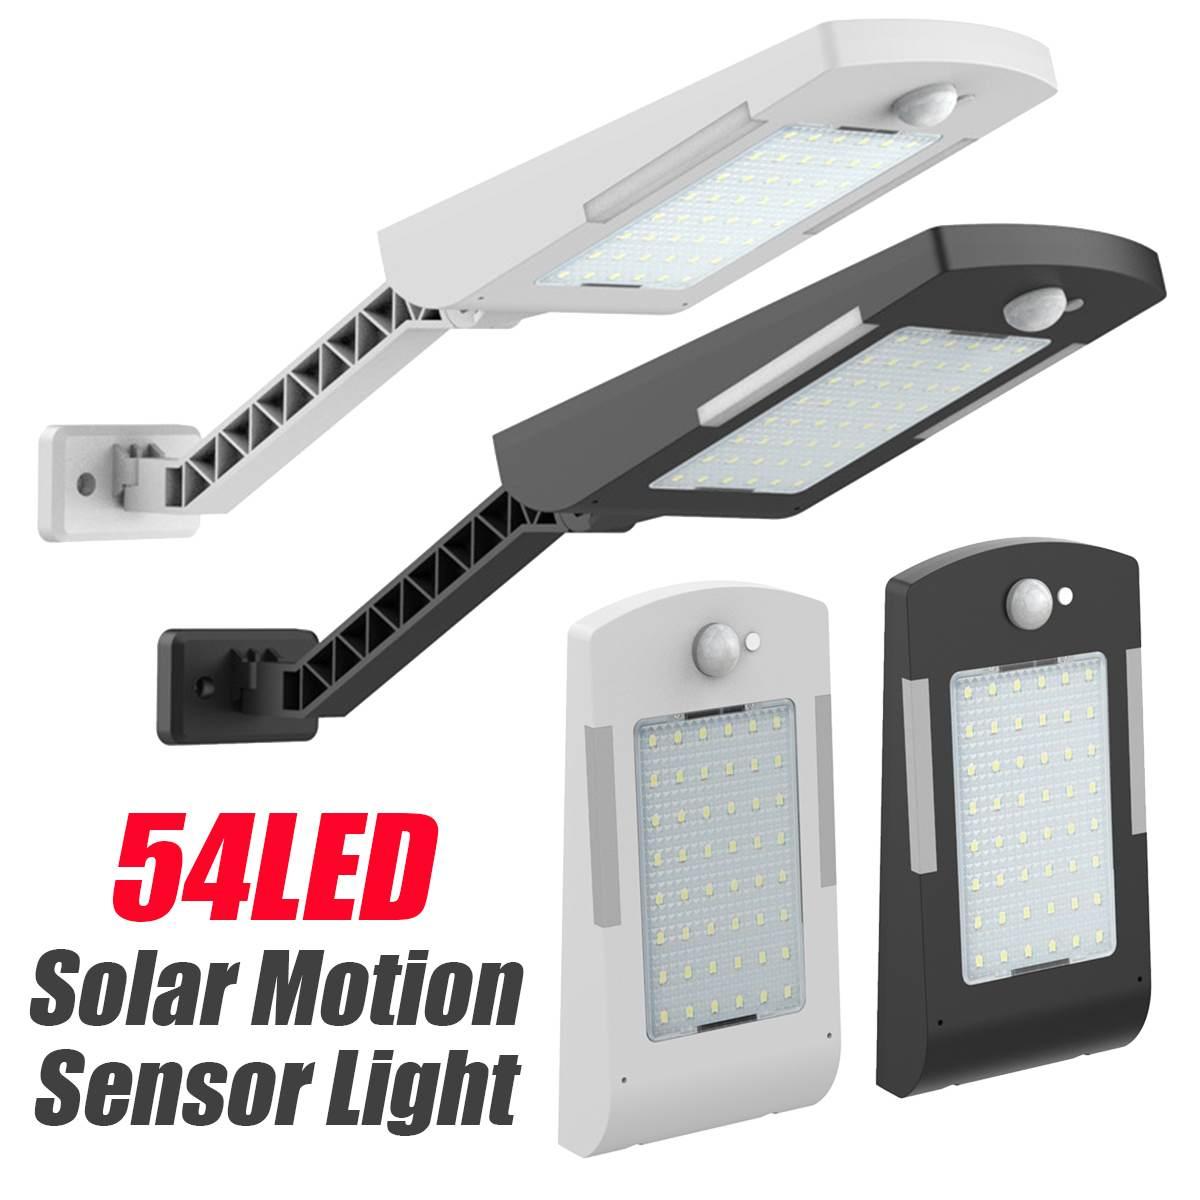 54 LED Solar Power Street Light 3 Modes PIR Motion Sensor Wall Lamp Outdoor IP65 Waterproof With Rotate Bracket Black White